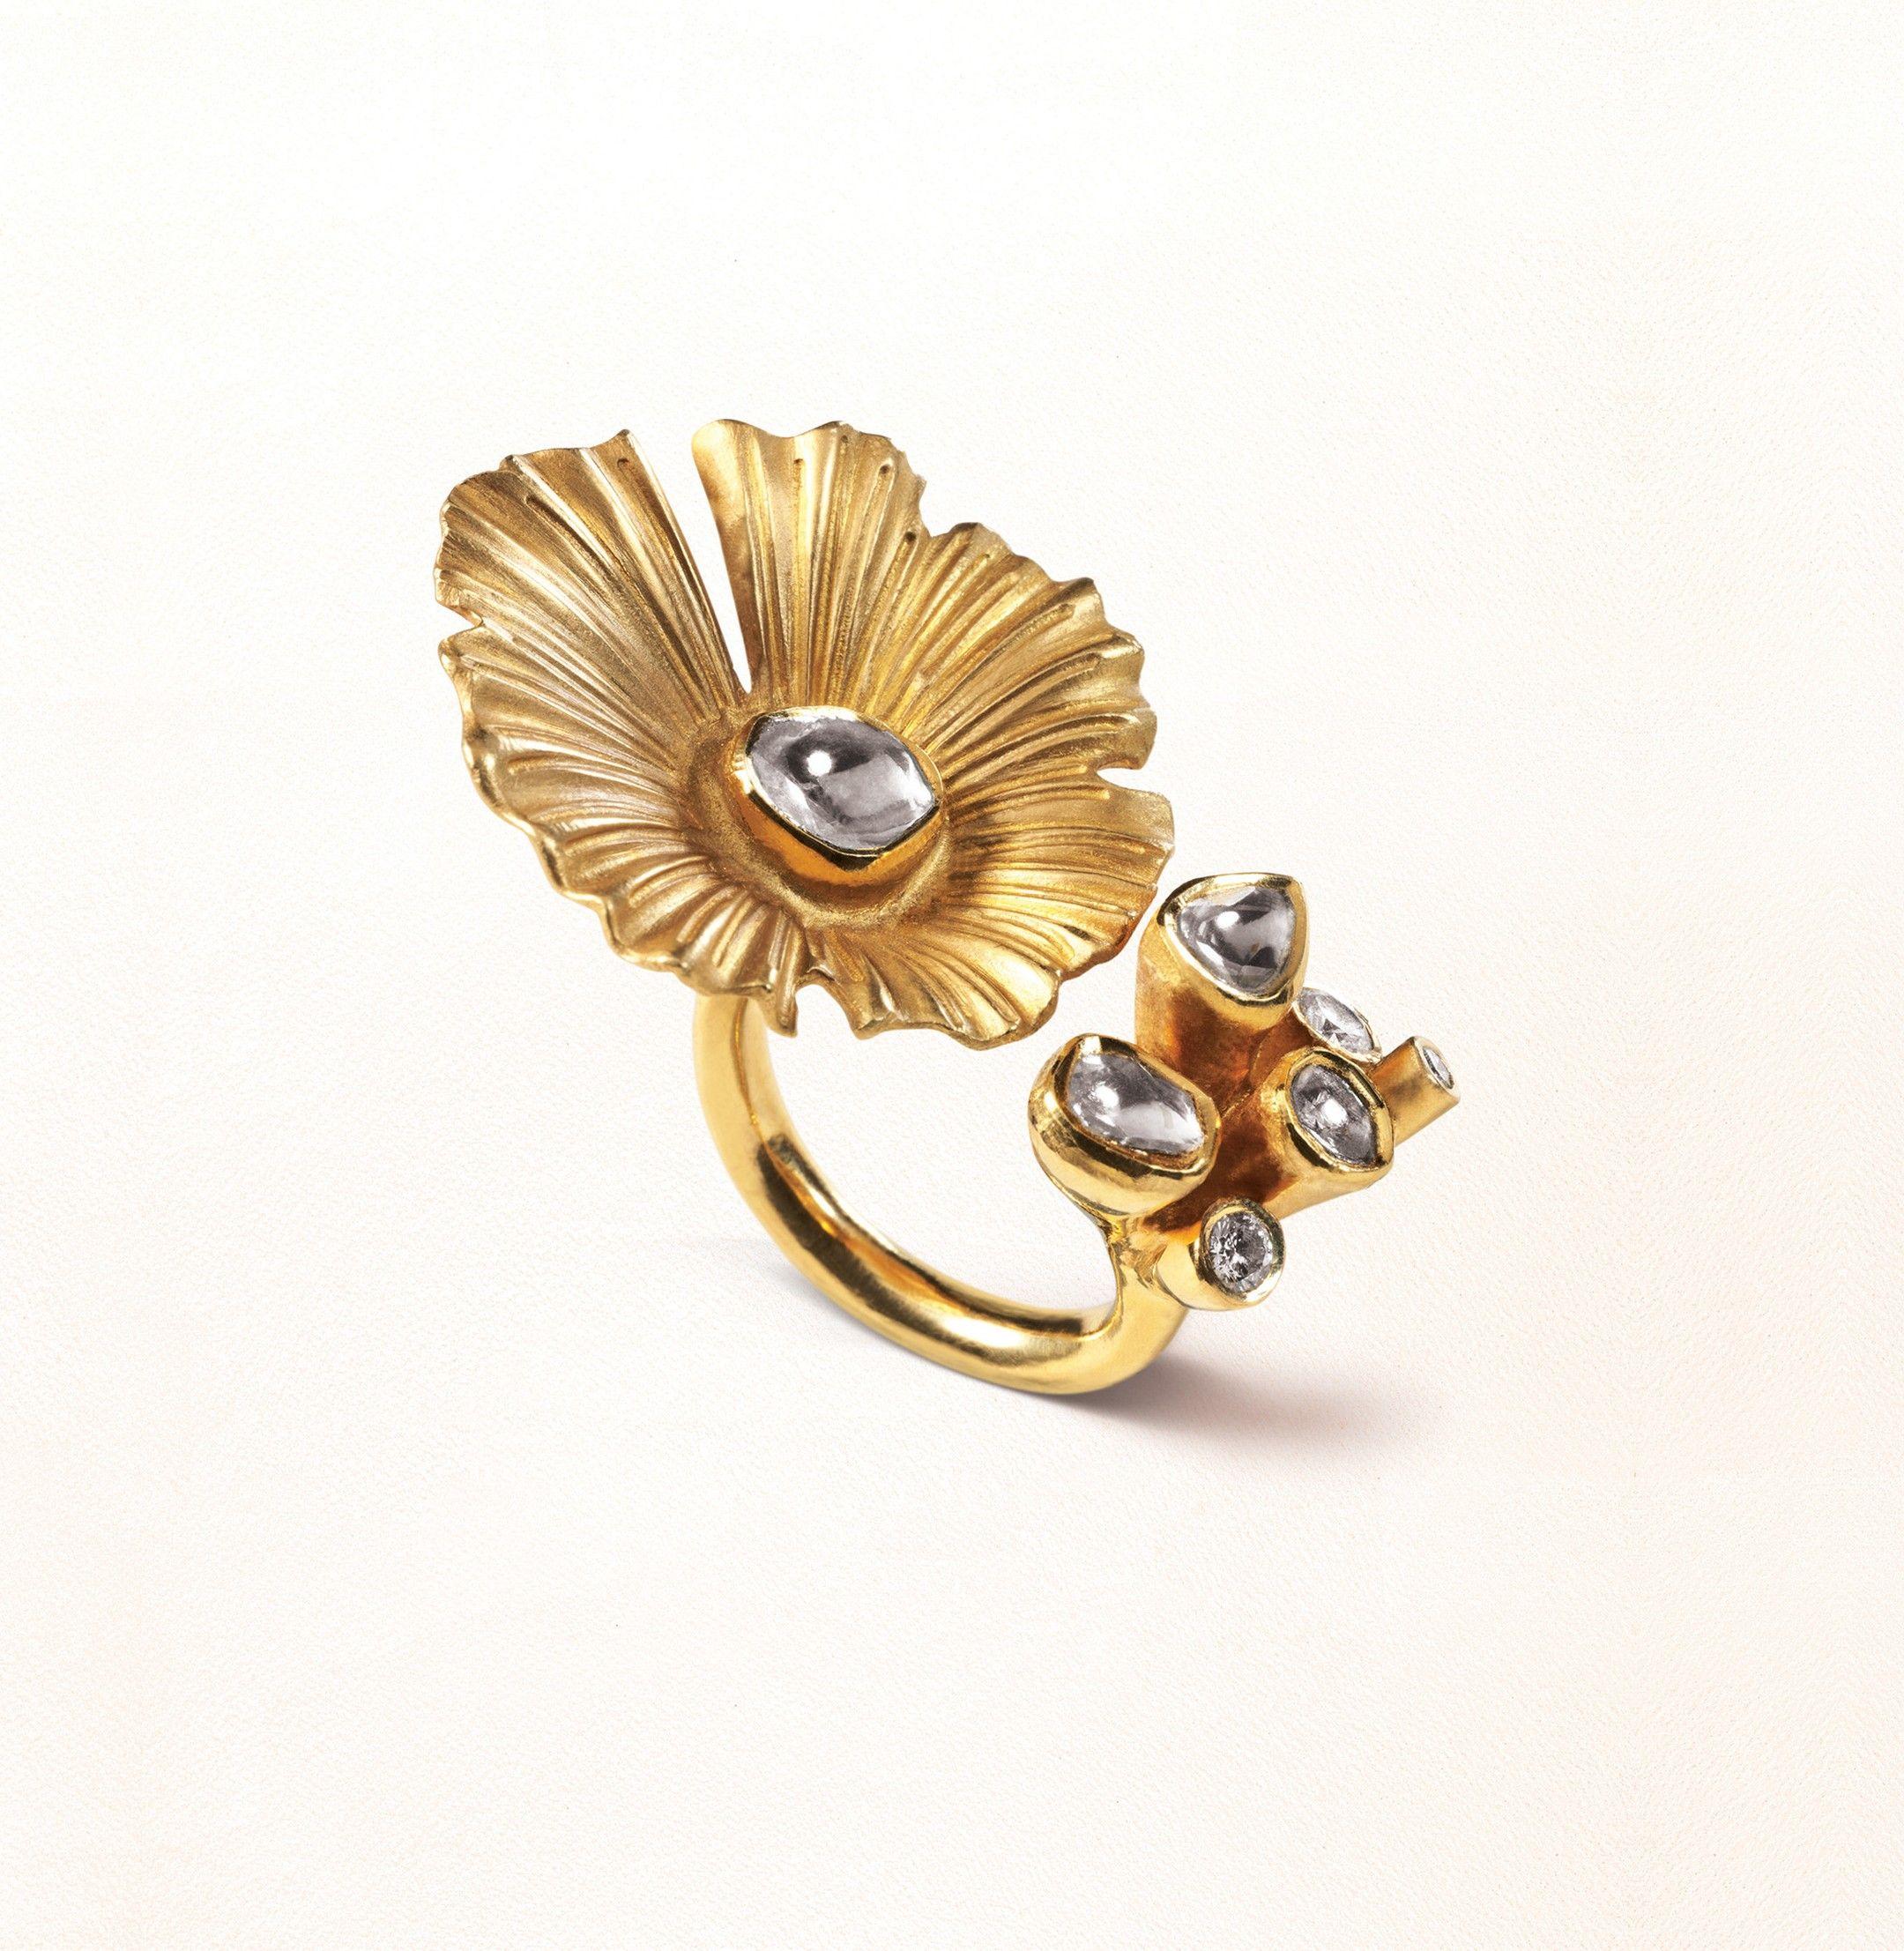 Zoya yellow gold lotus ring with polki diamonds.